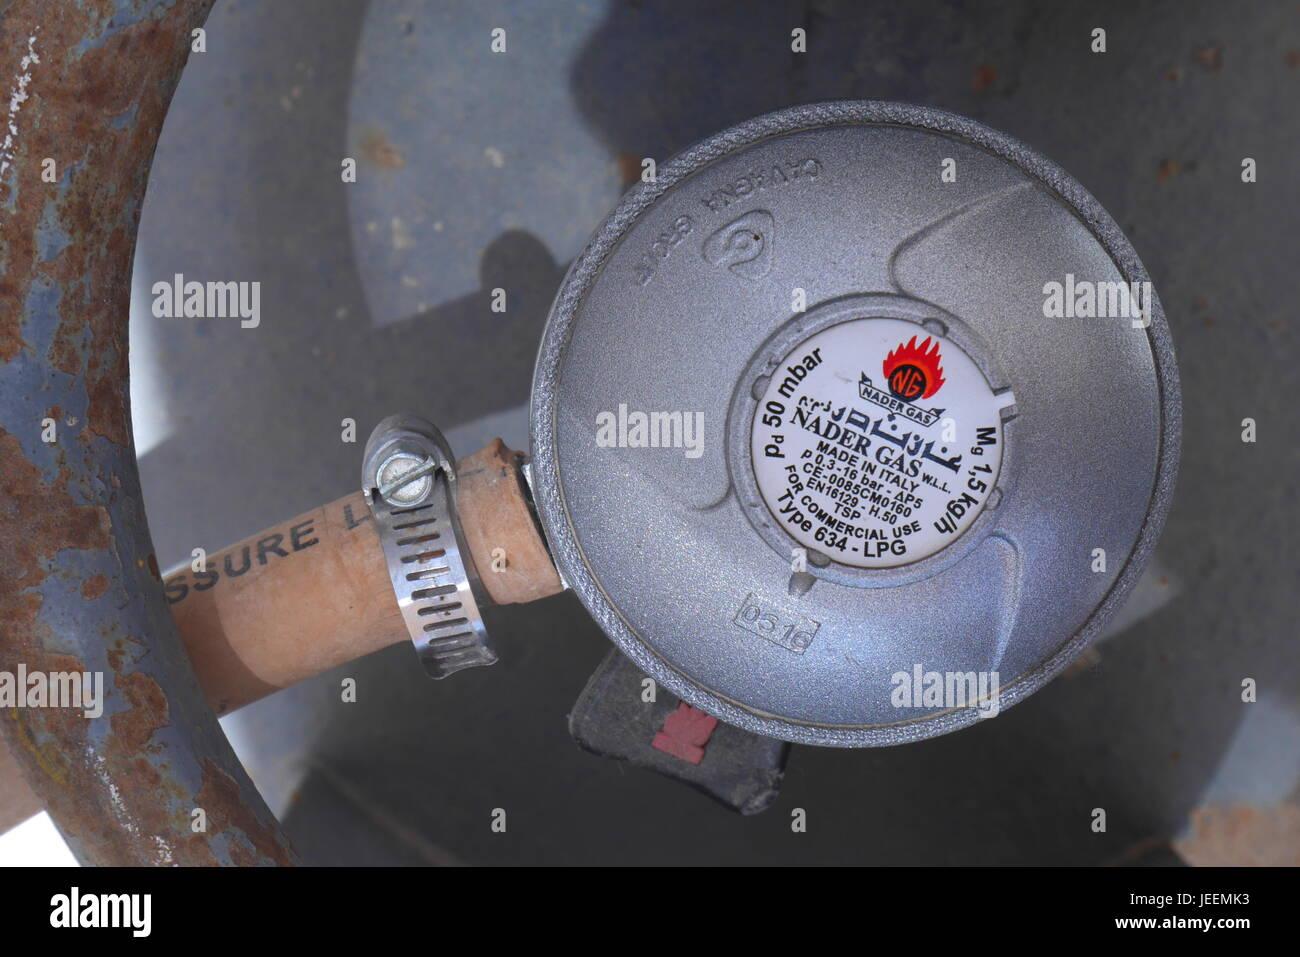 Domestic gas bottle regulator - Stock Image